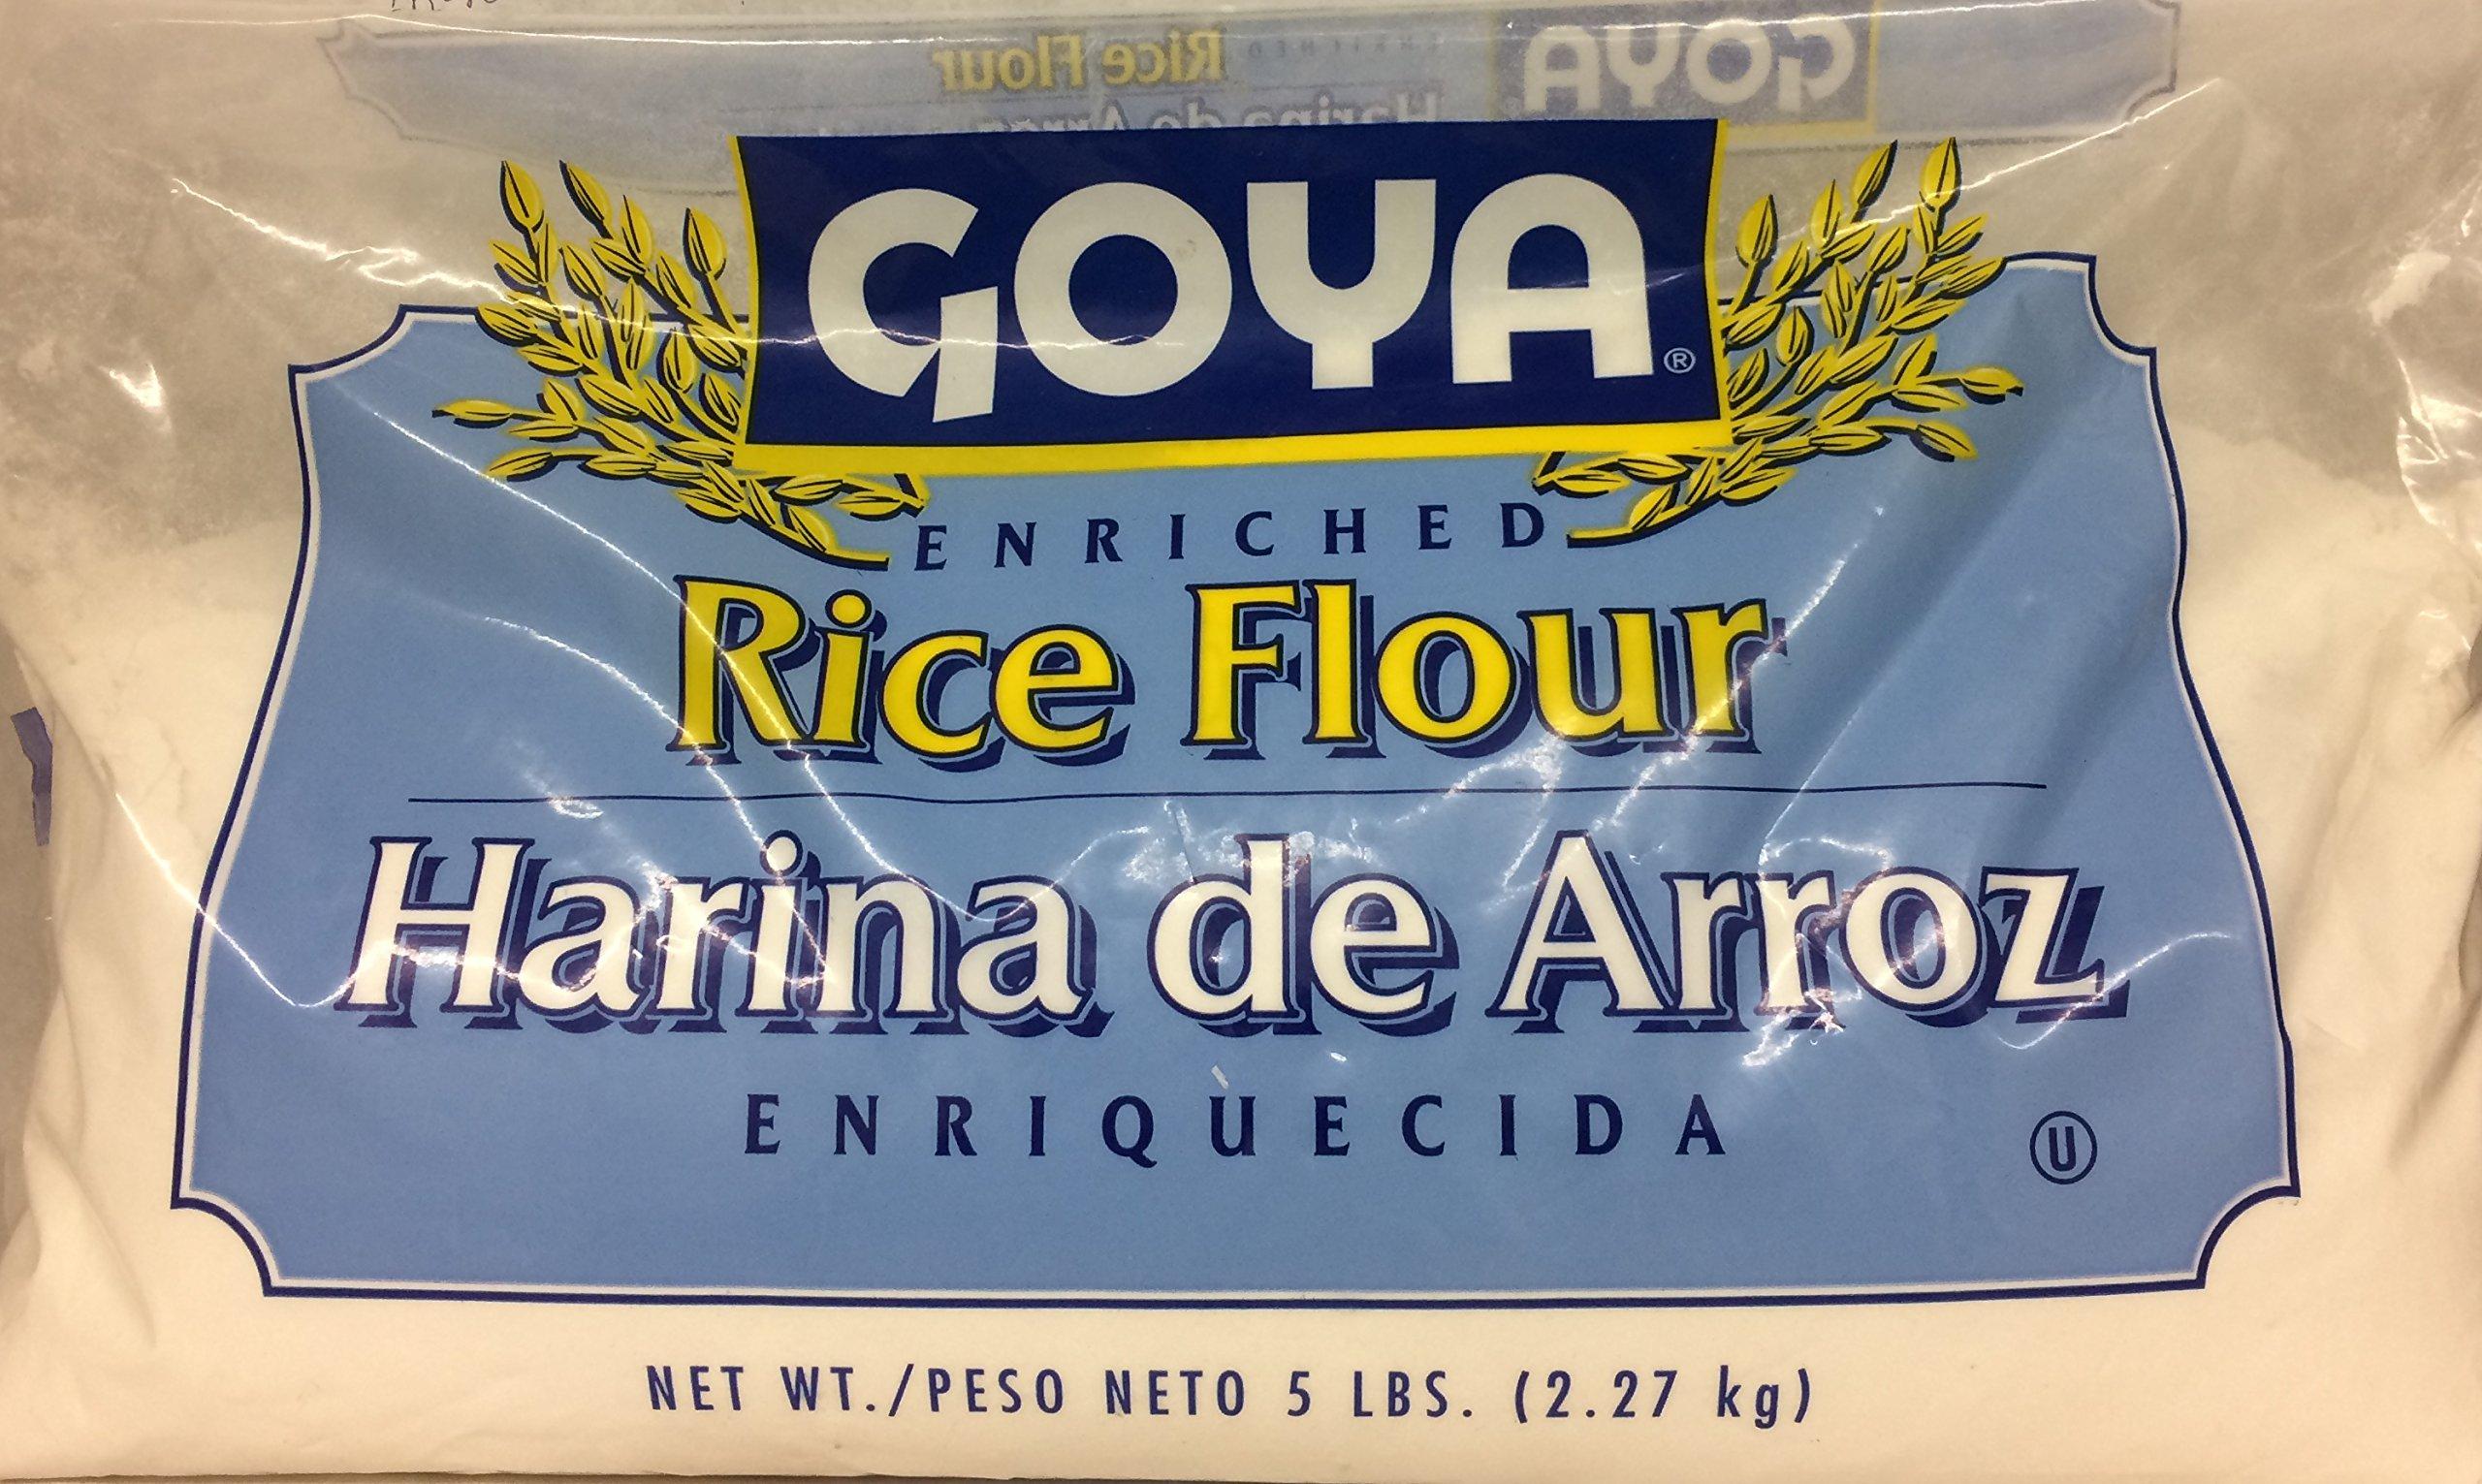 Goya Enriched Rice Flour Harina De Arroz 80 Oz. Pack Of 3.